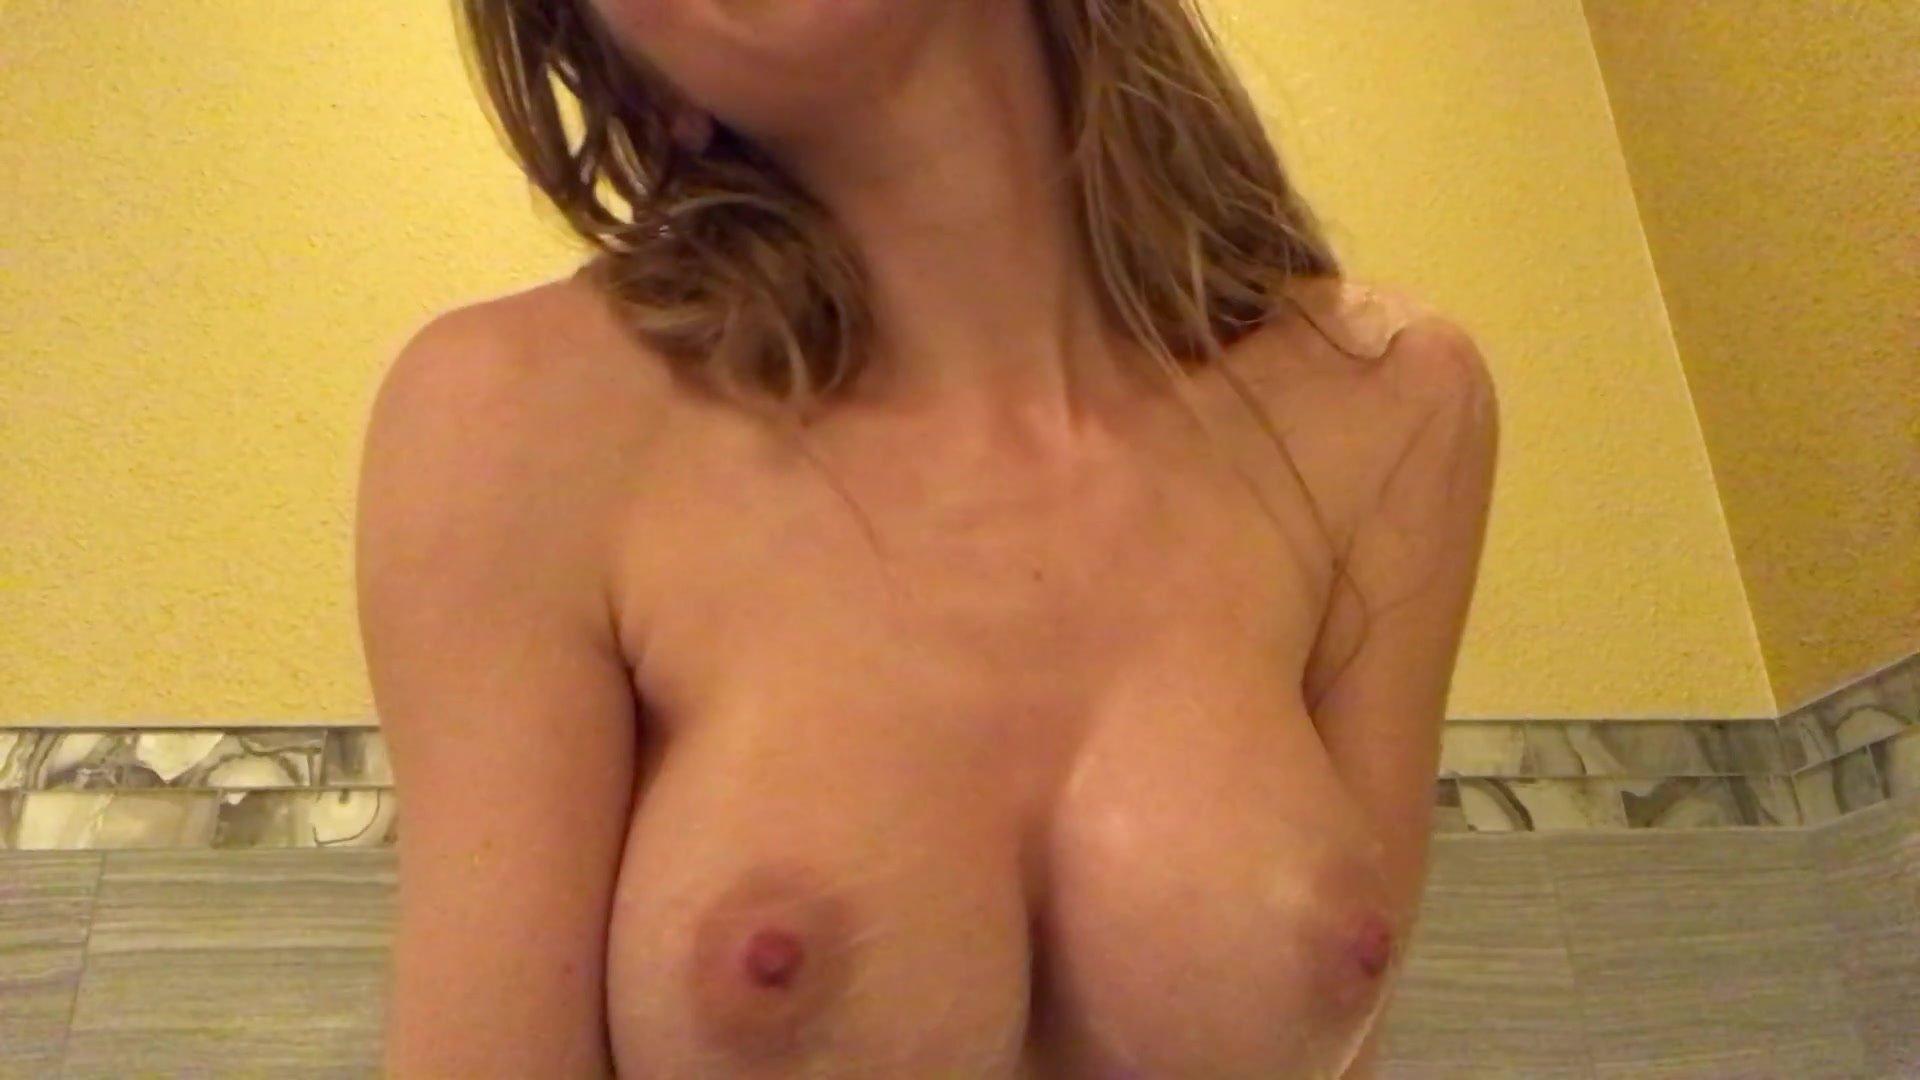 Nadia russian nude